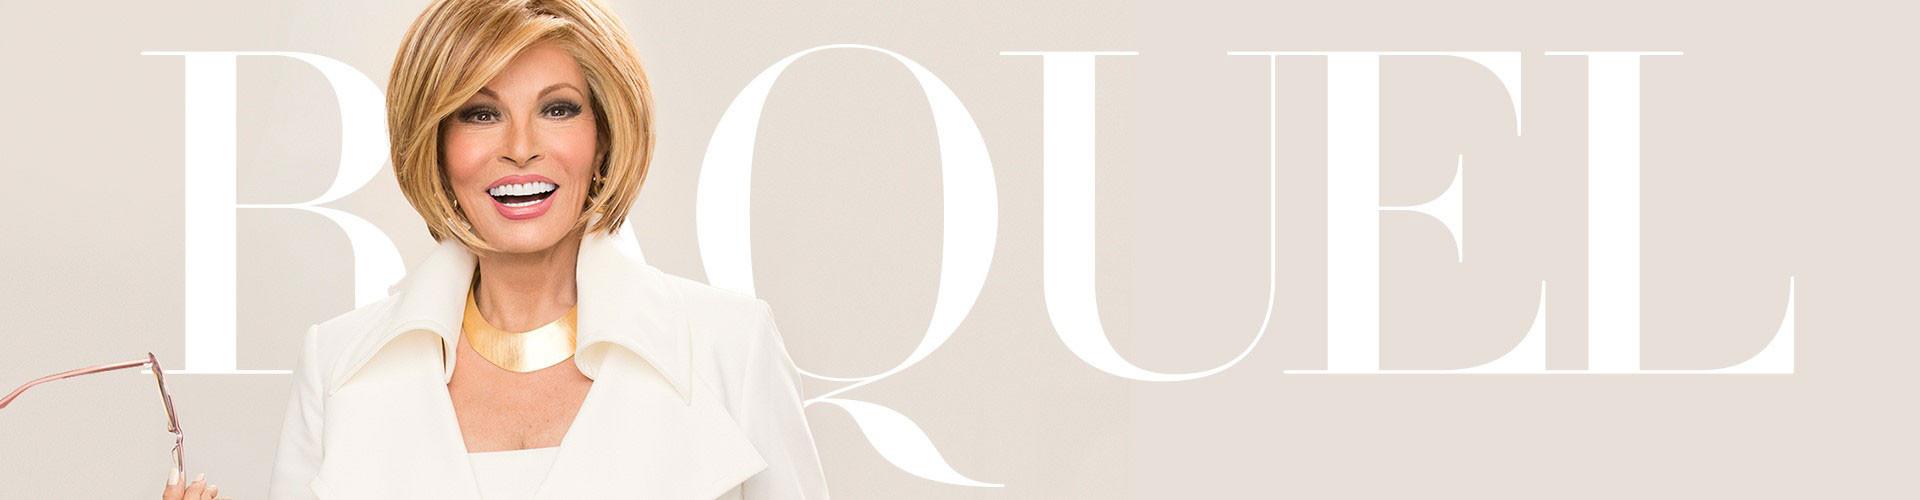 rw brand banner 05 opt - Raquel welch lasulje luksuz, čar in eleganca.